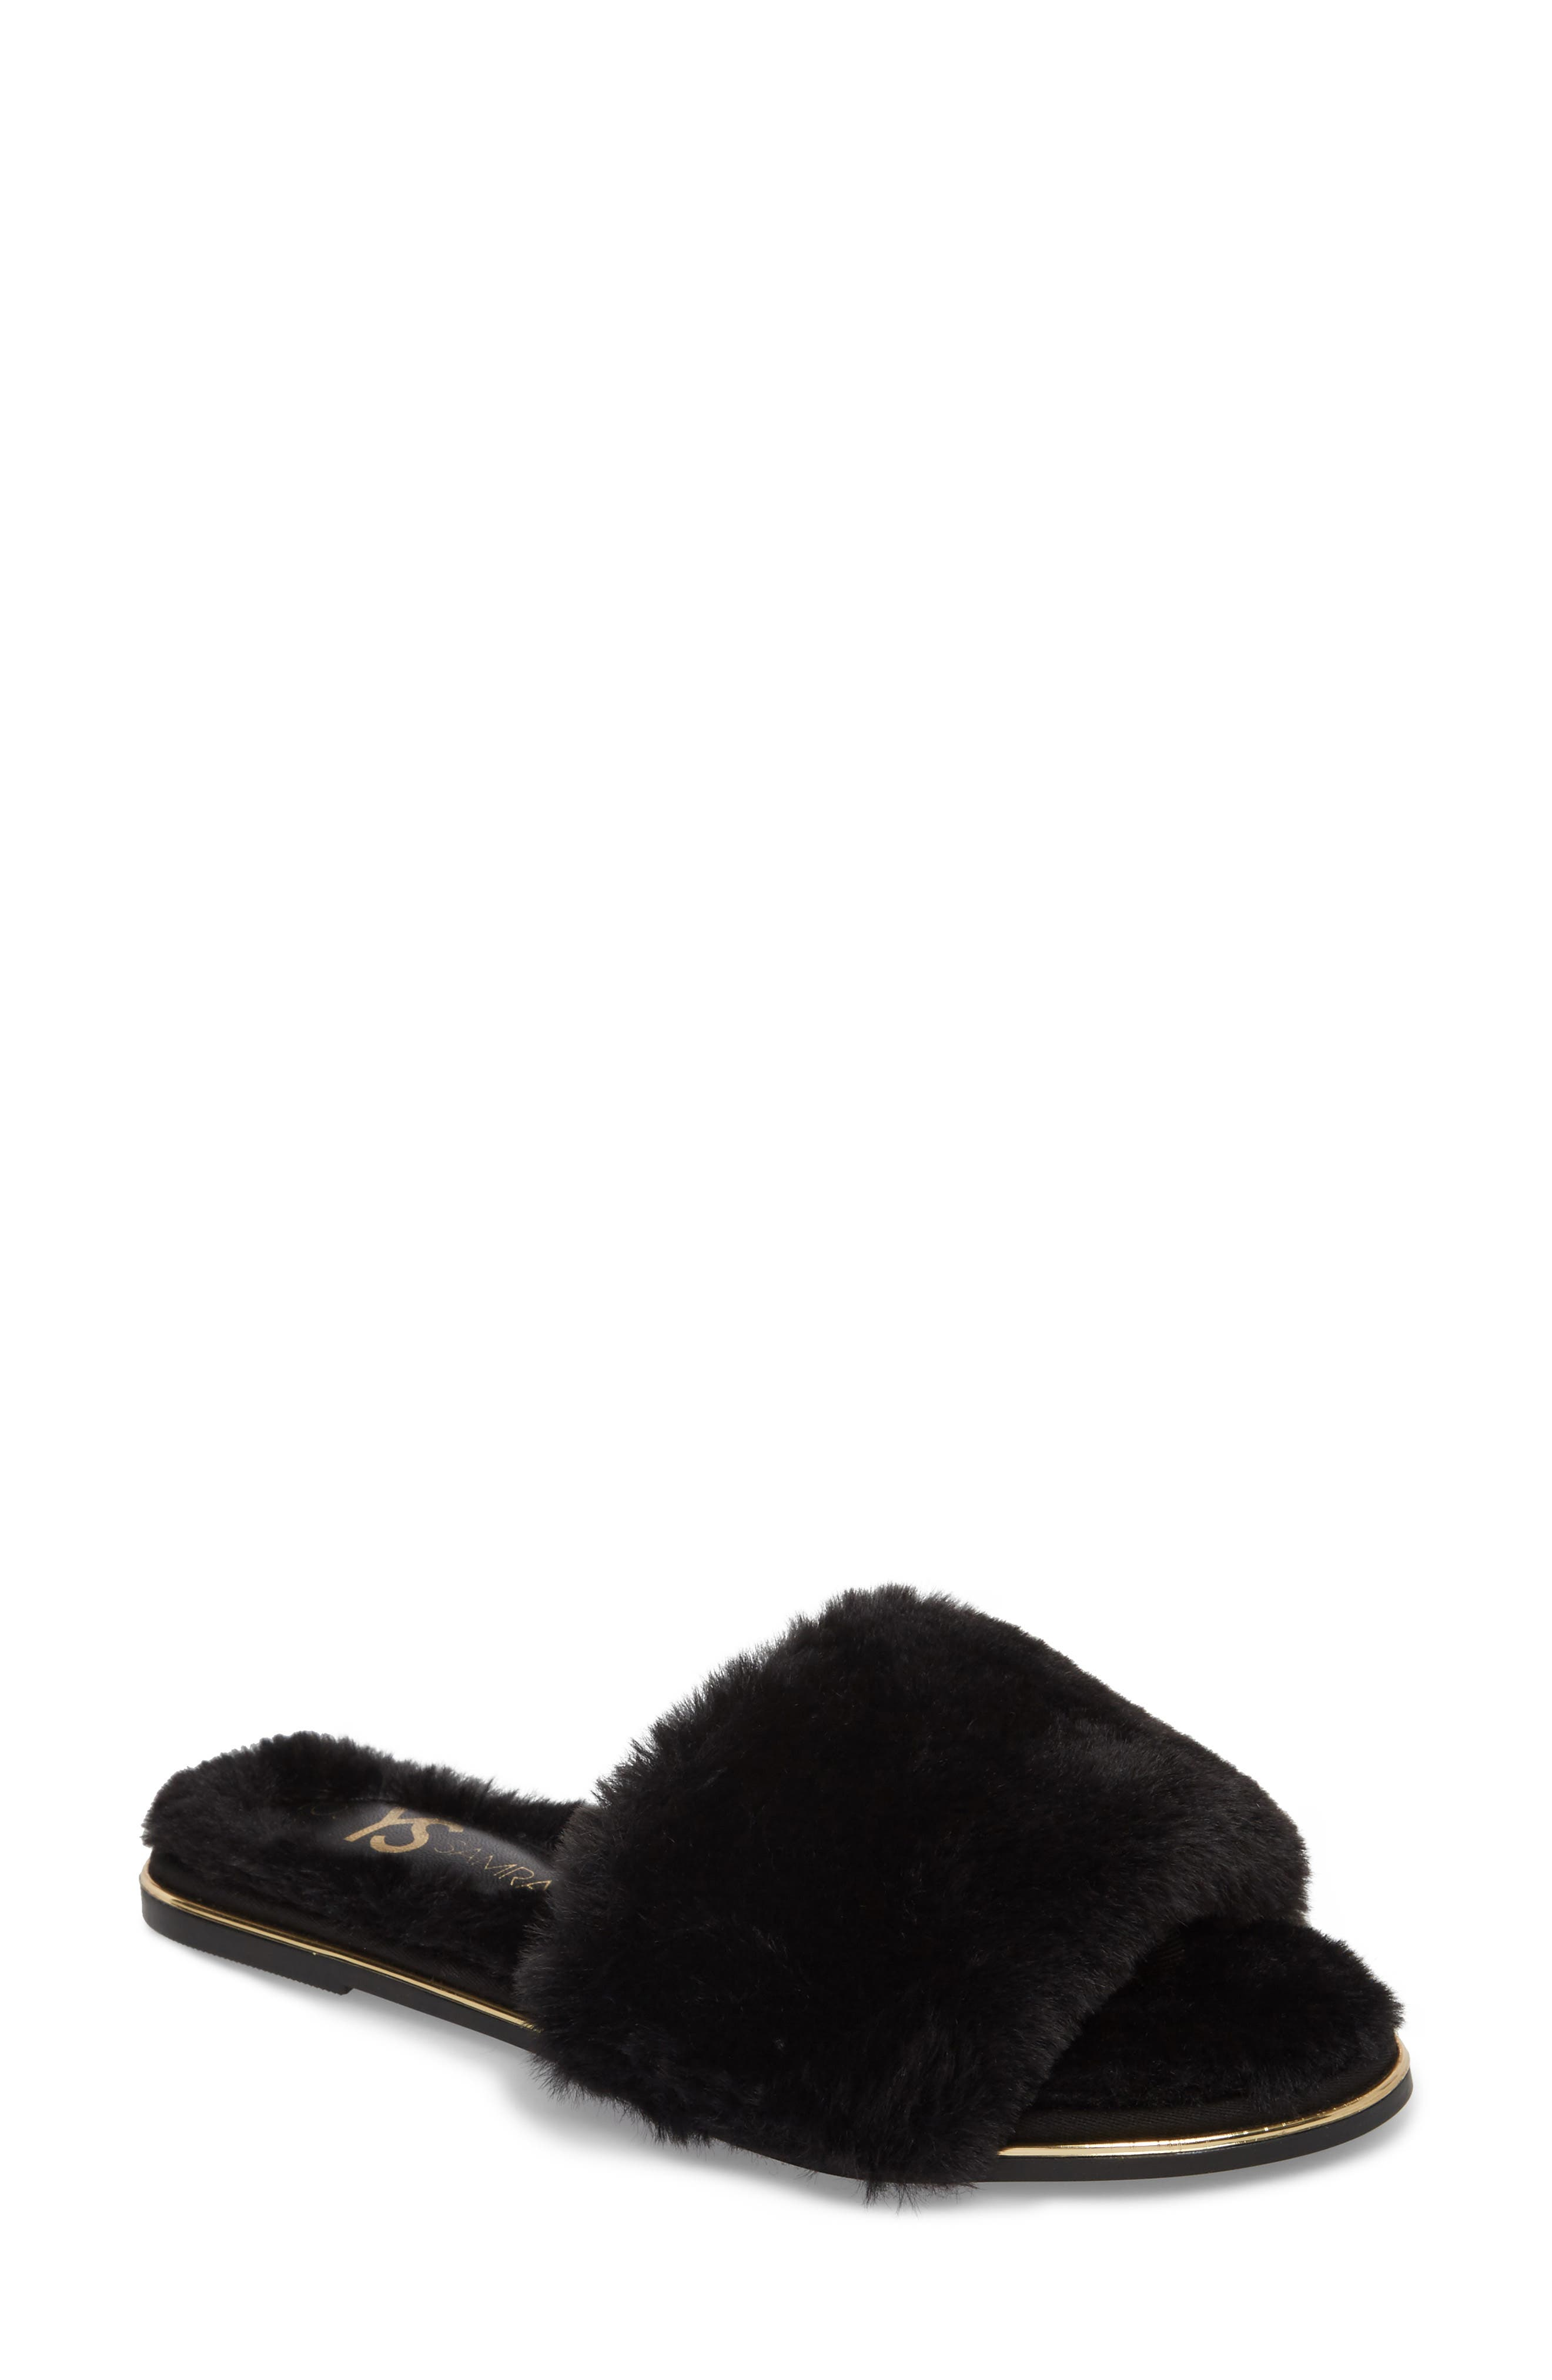 Rose Faux Fur Slide Sandal,                             Main thumbnail 1, color,                             BLACK FAUX FUR